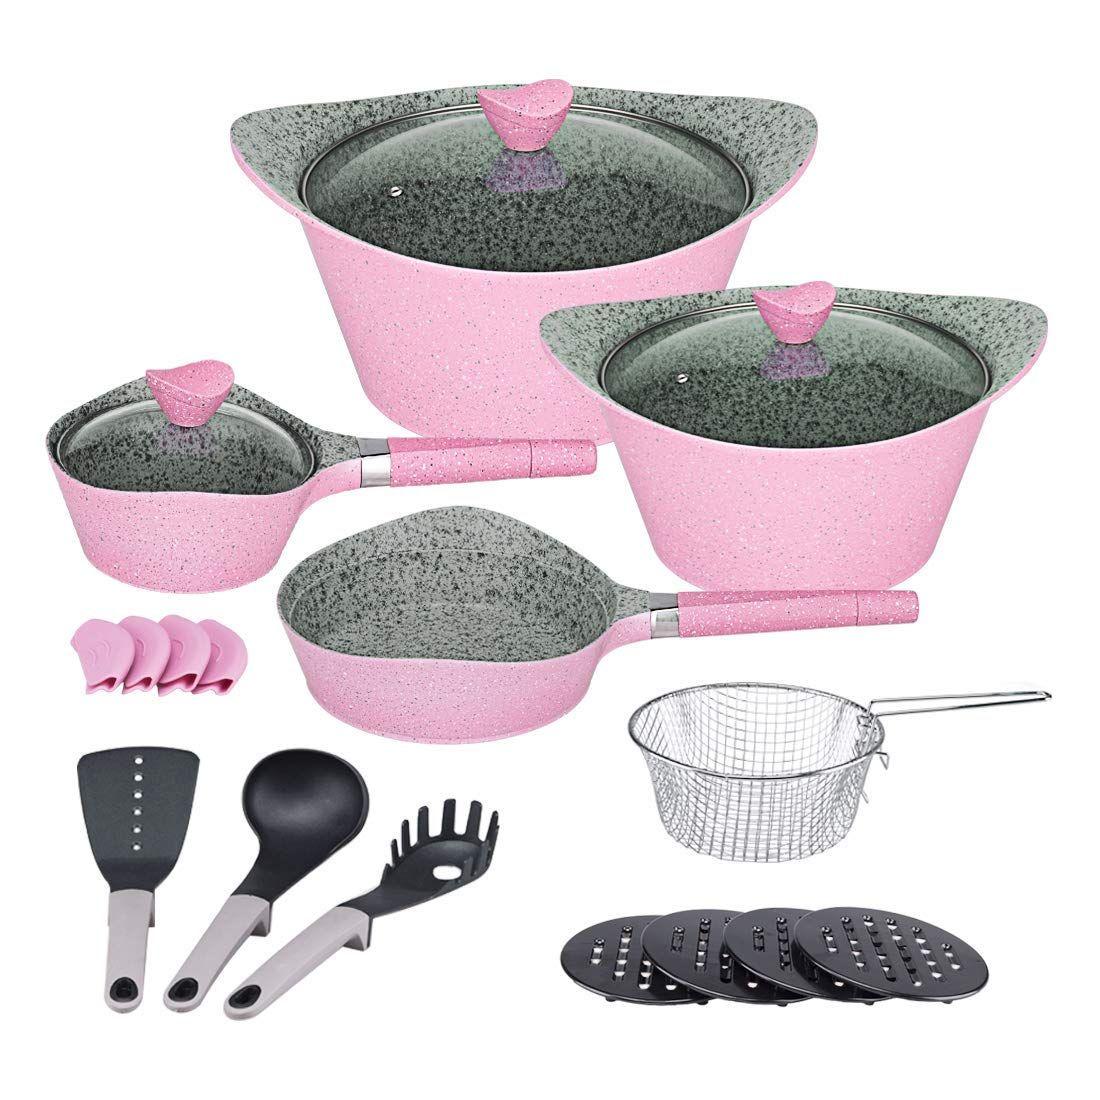 Ceramic cookware set dishwasher safe nonstick aluminum